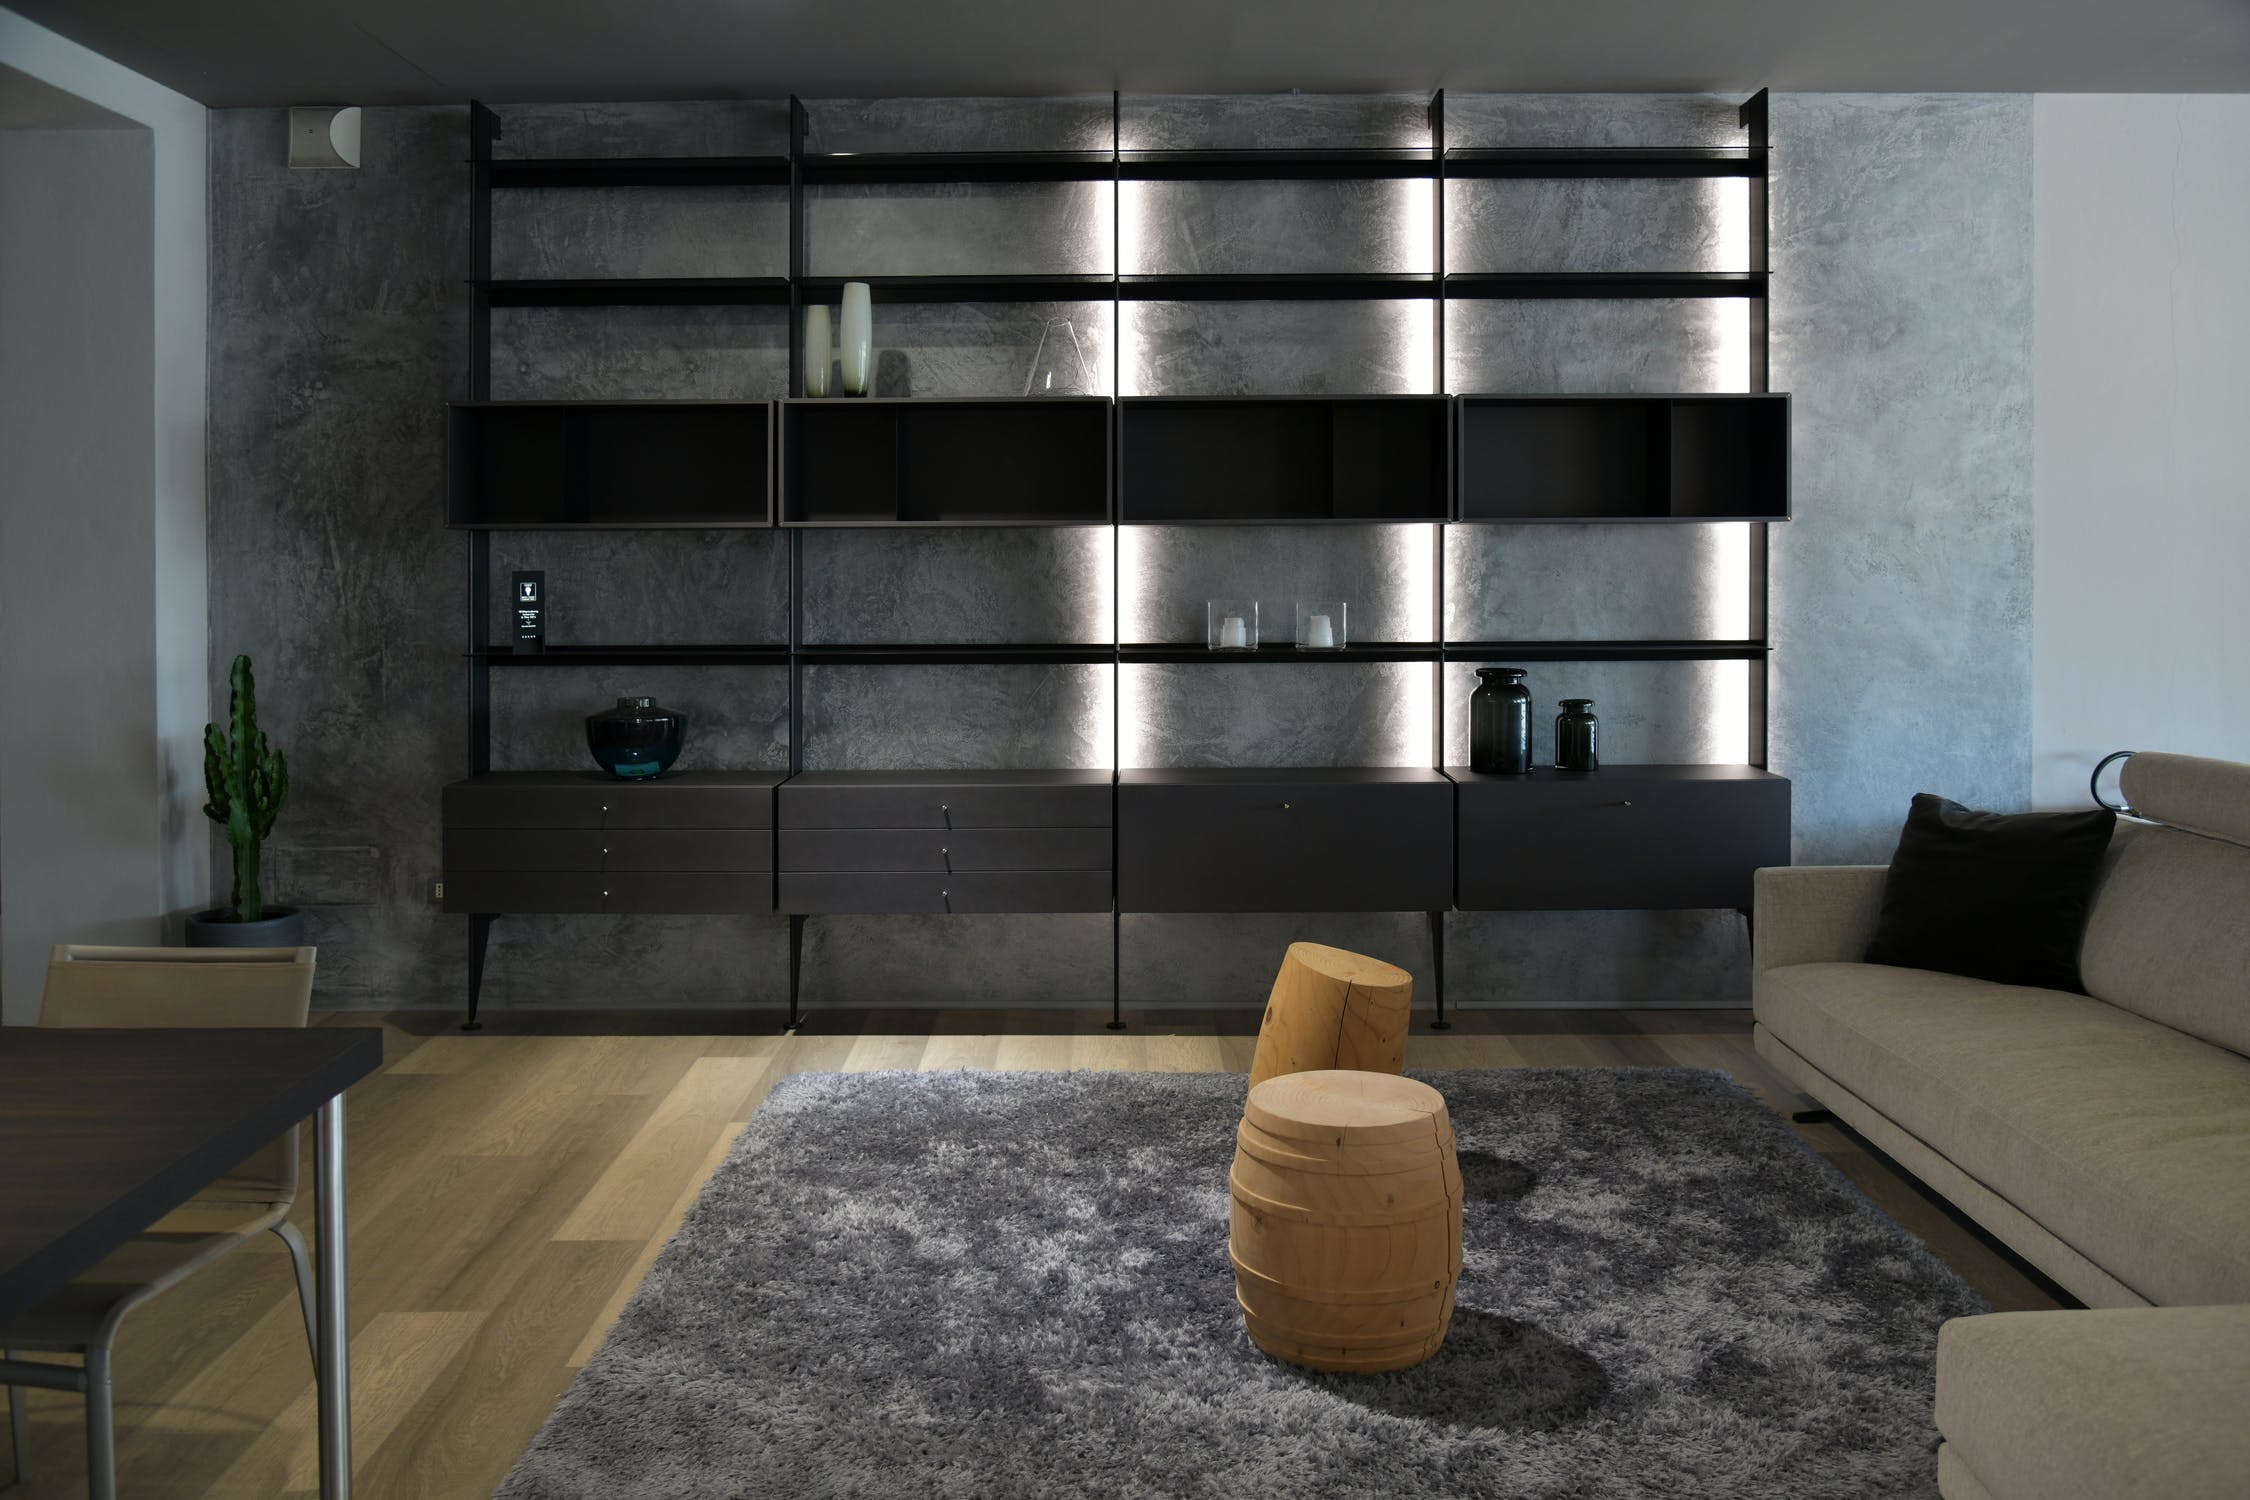 tipos de iluminacion - iluminacion decorativa